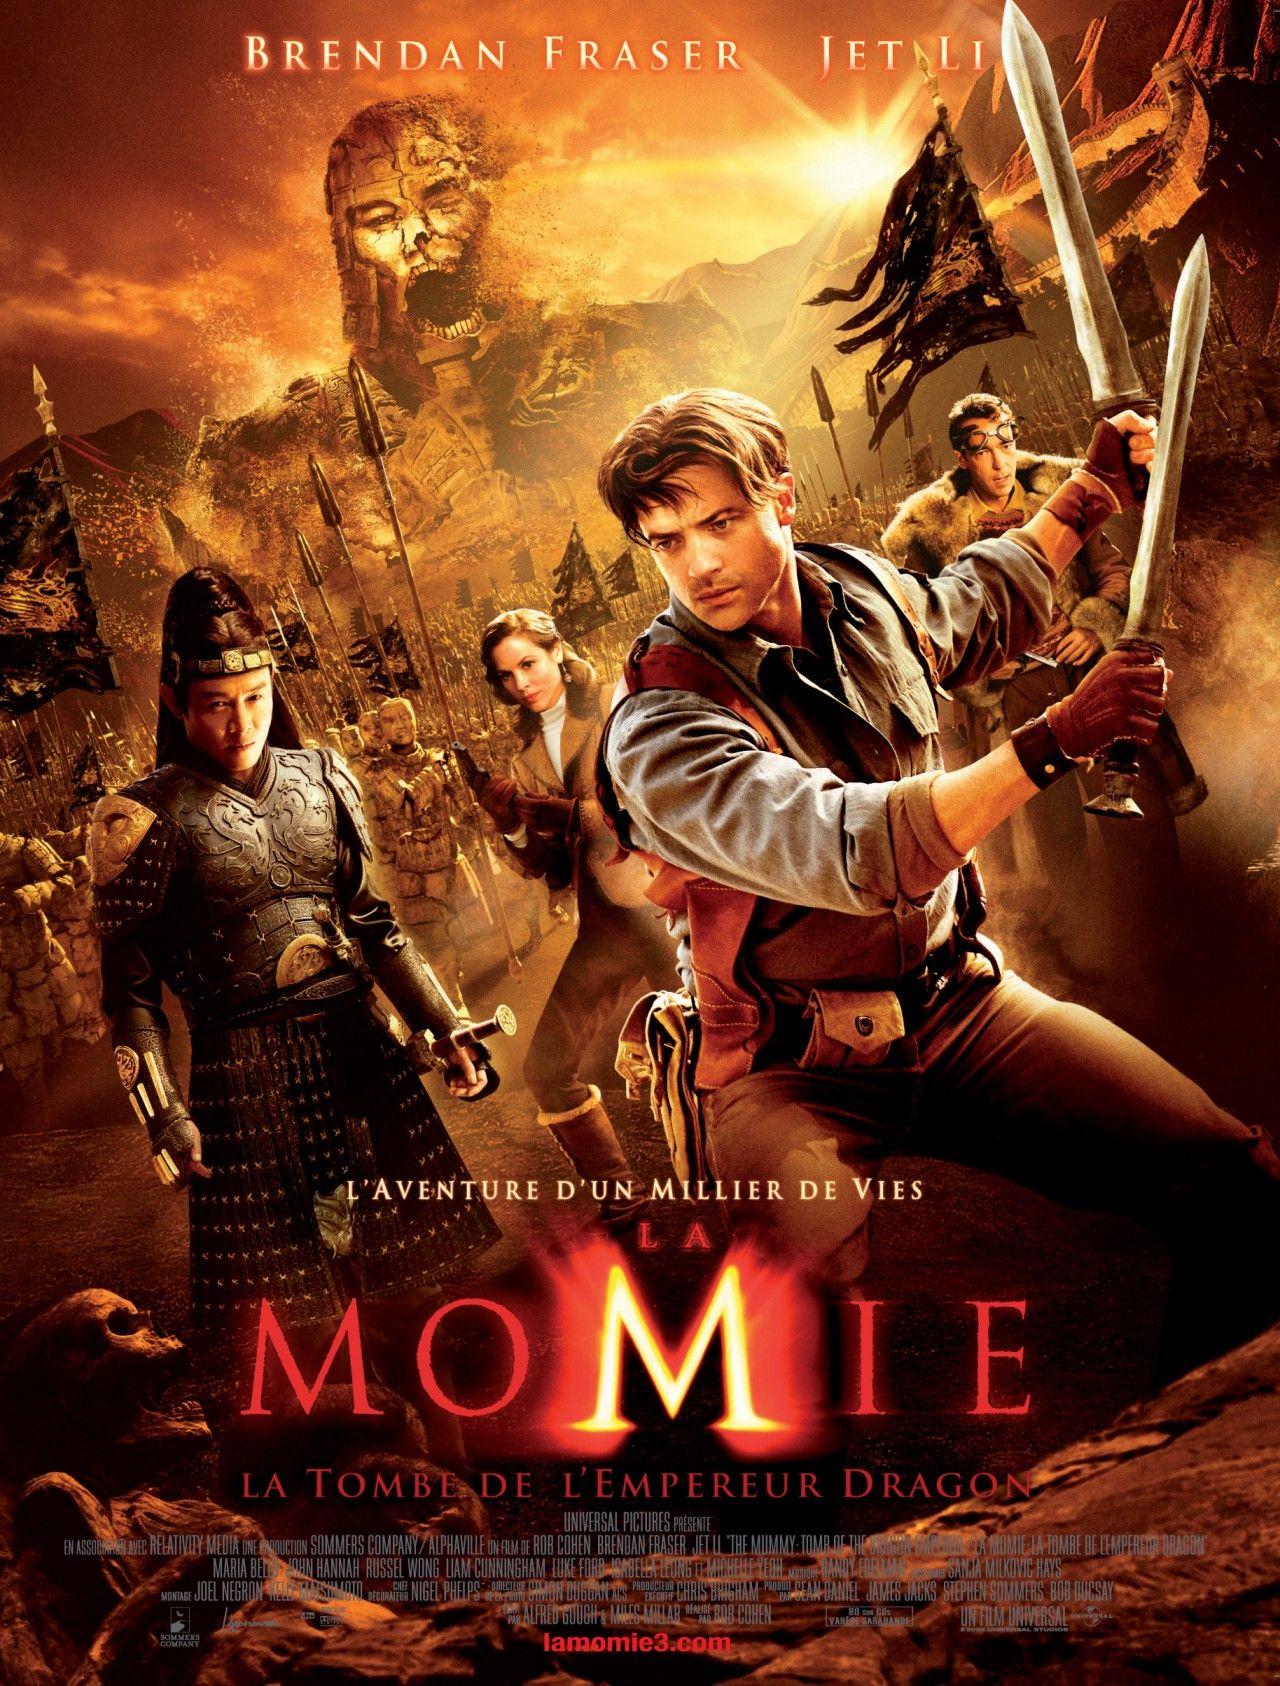 La Momie 2017 Streaming : momie, streaming, Sonitta, Movies, Watched, Mummy, Movie,, Mummy,, Online